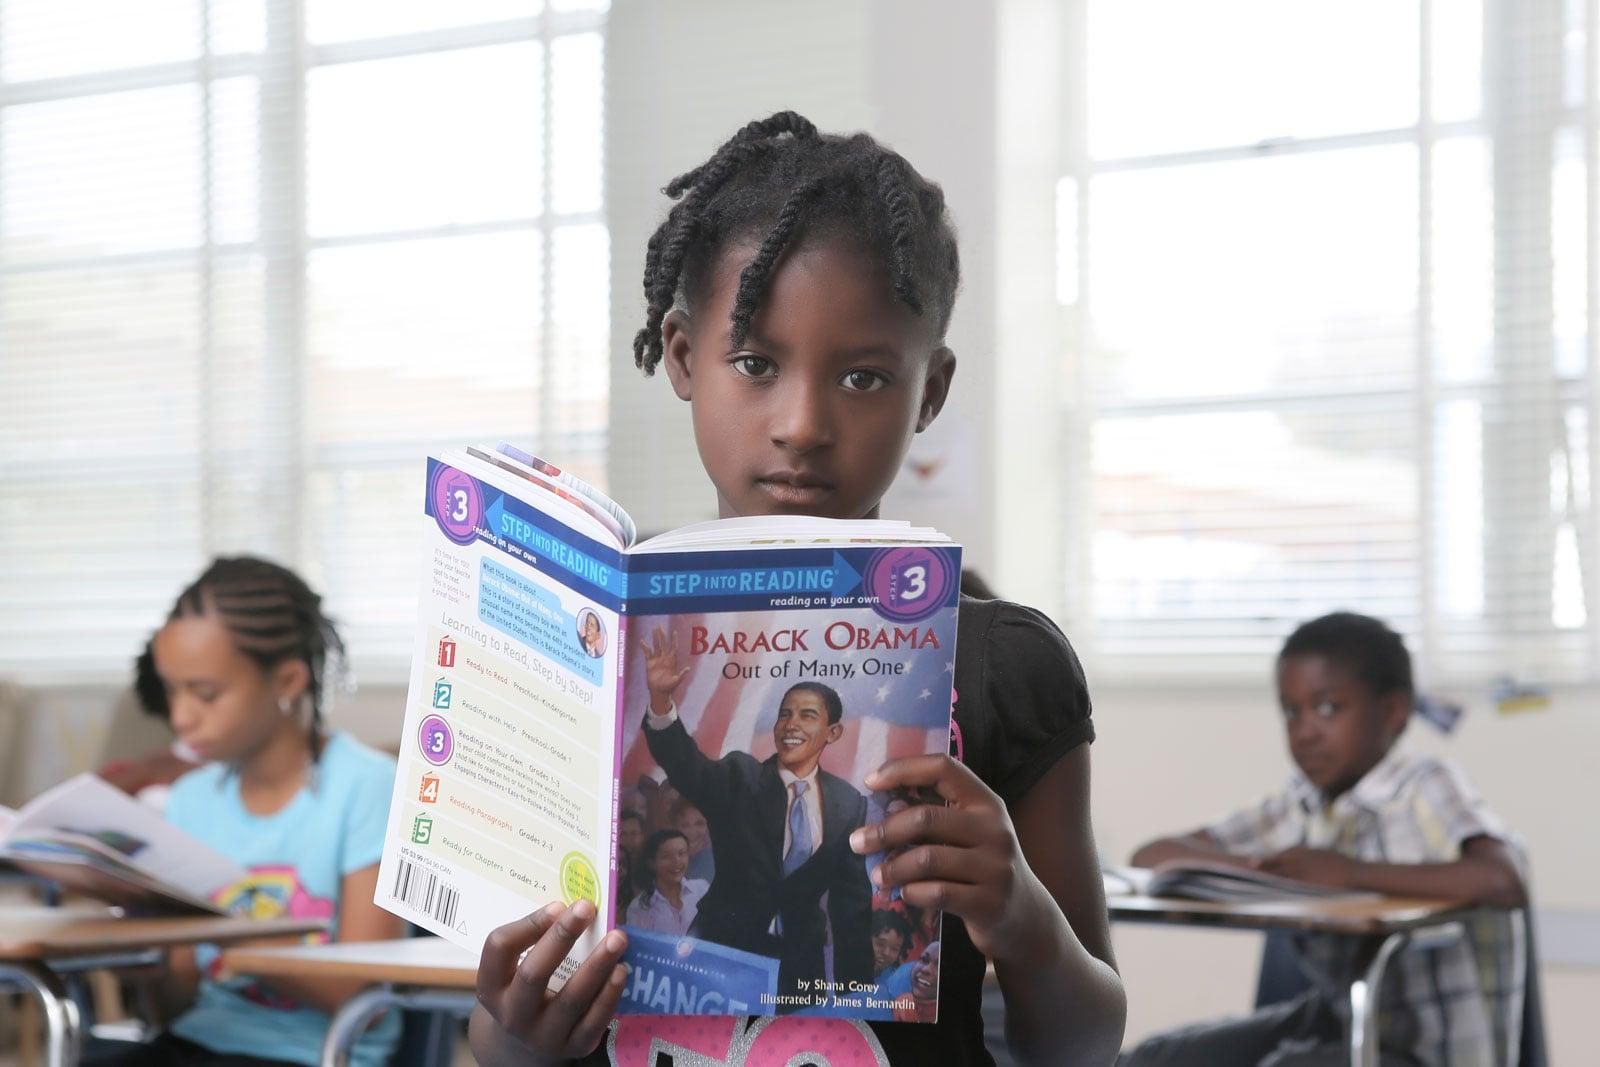 girl-reading-obama-book_v1-nf.jpg